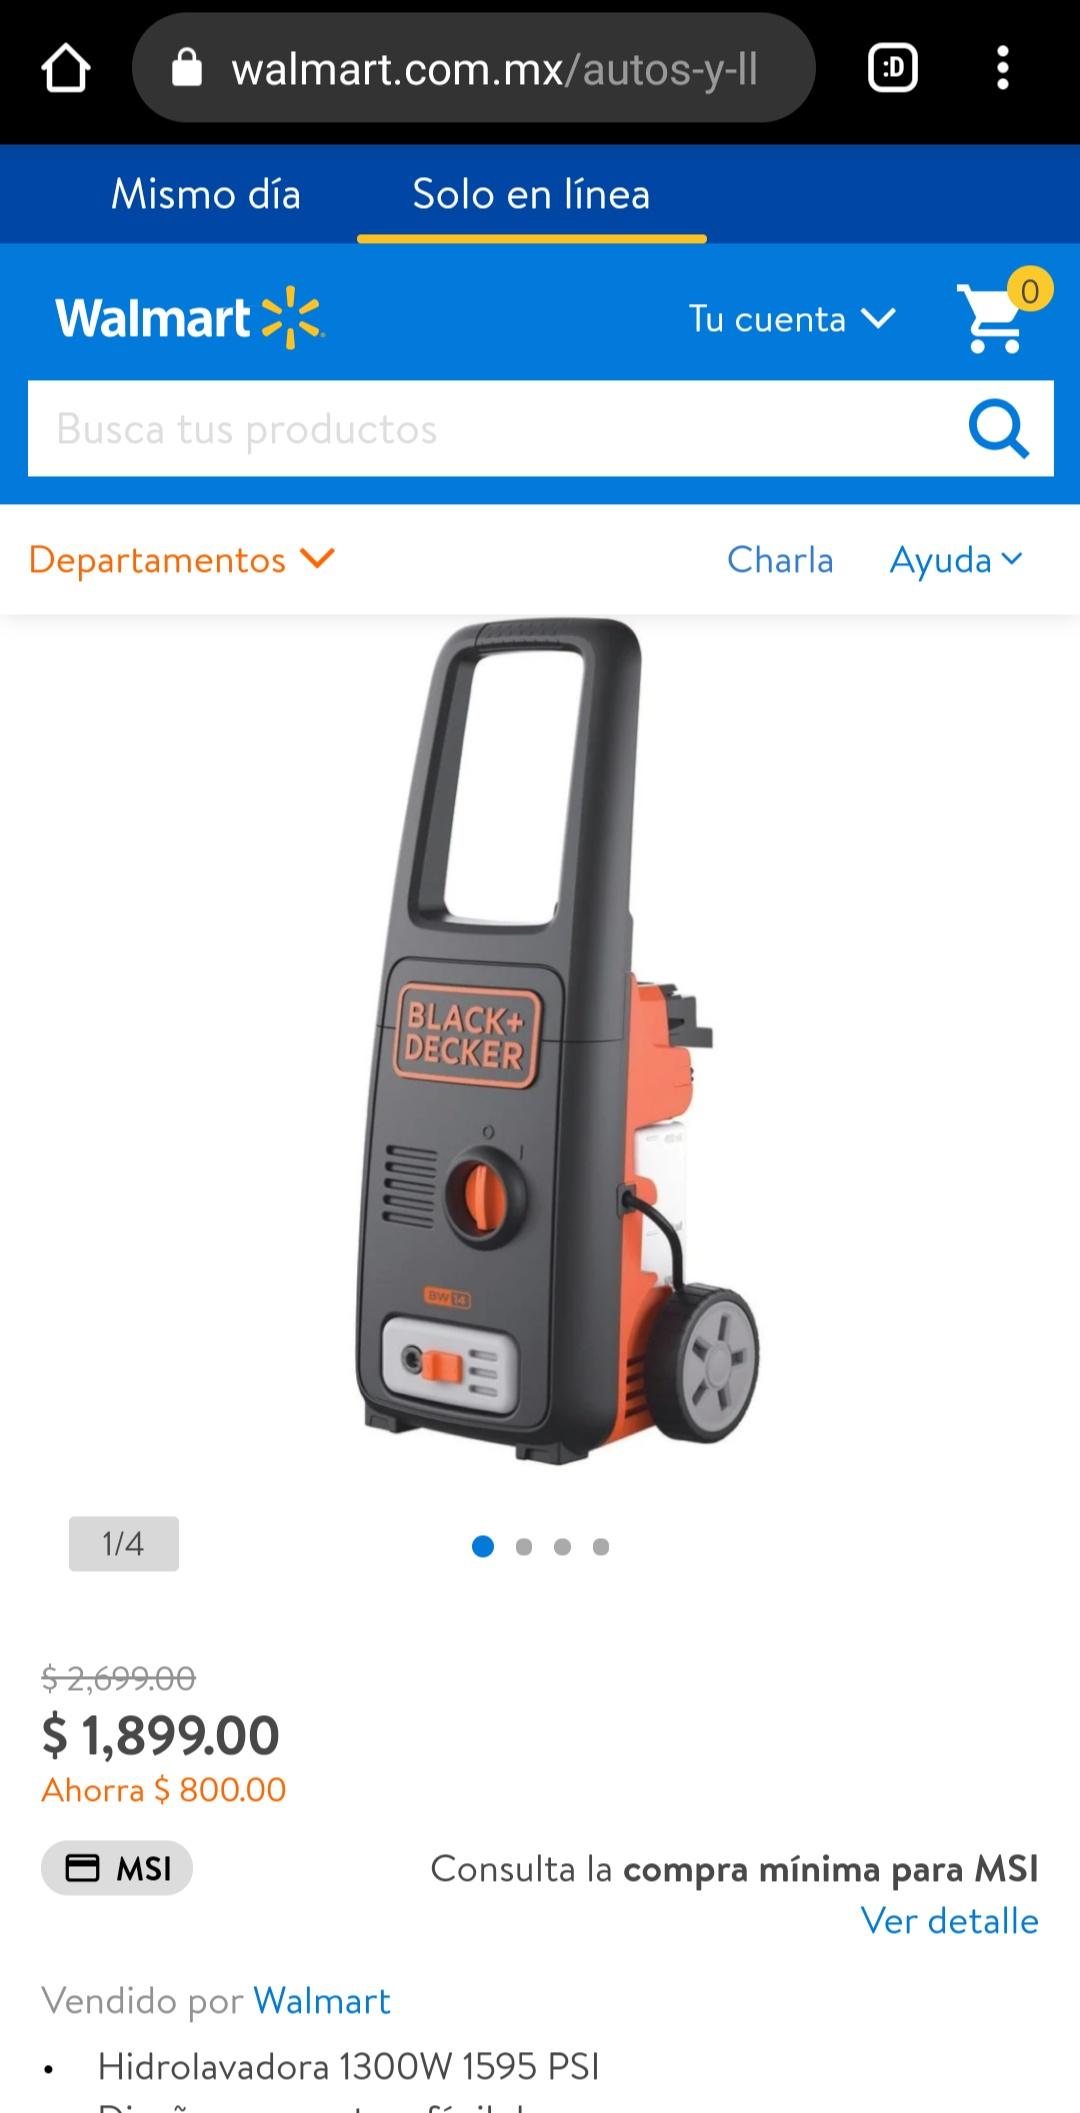 Walmart en línea: hidrolavadora black and Decker 1595 psi